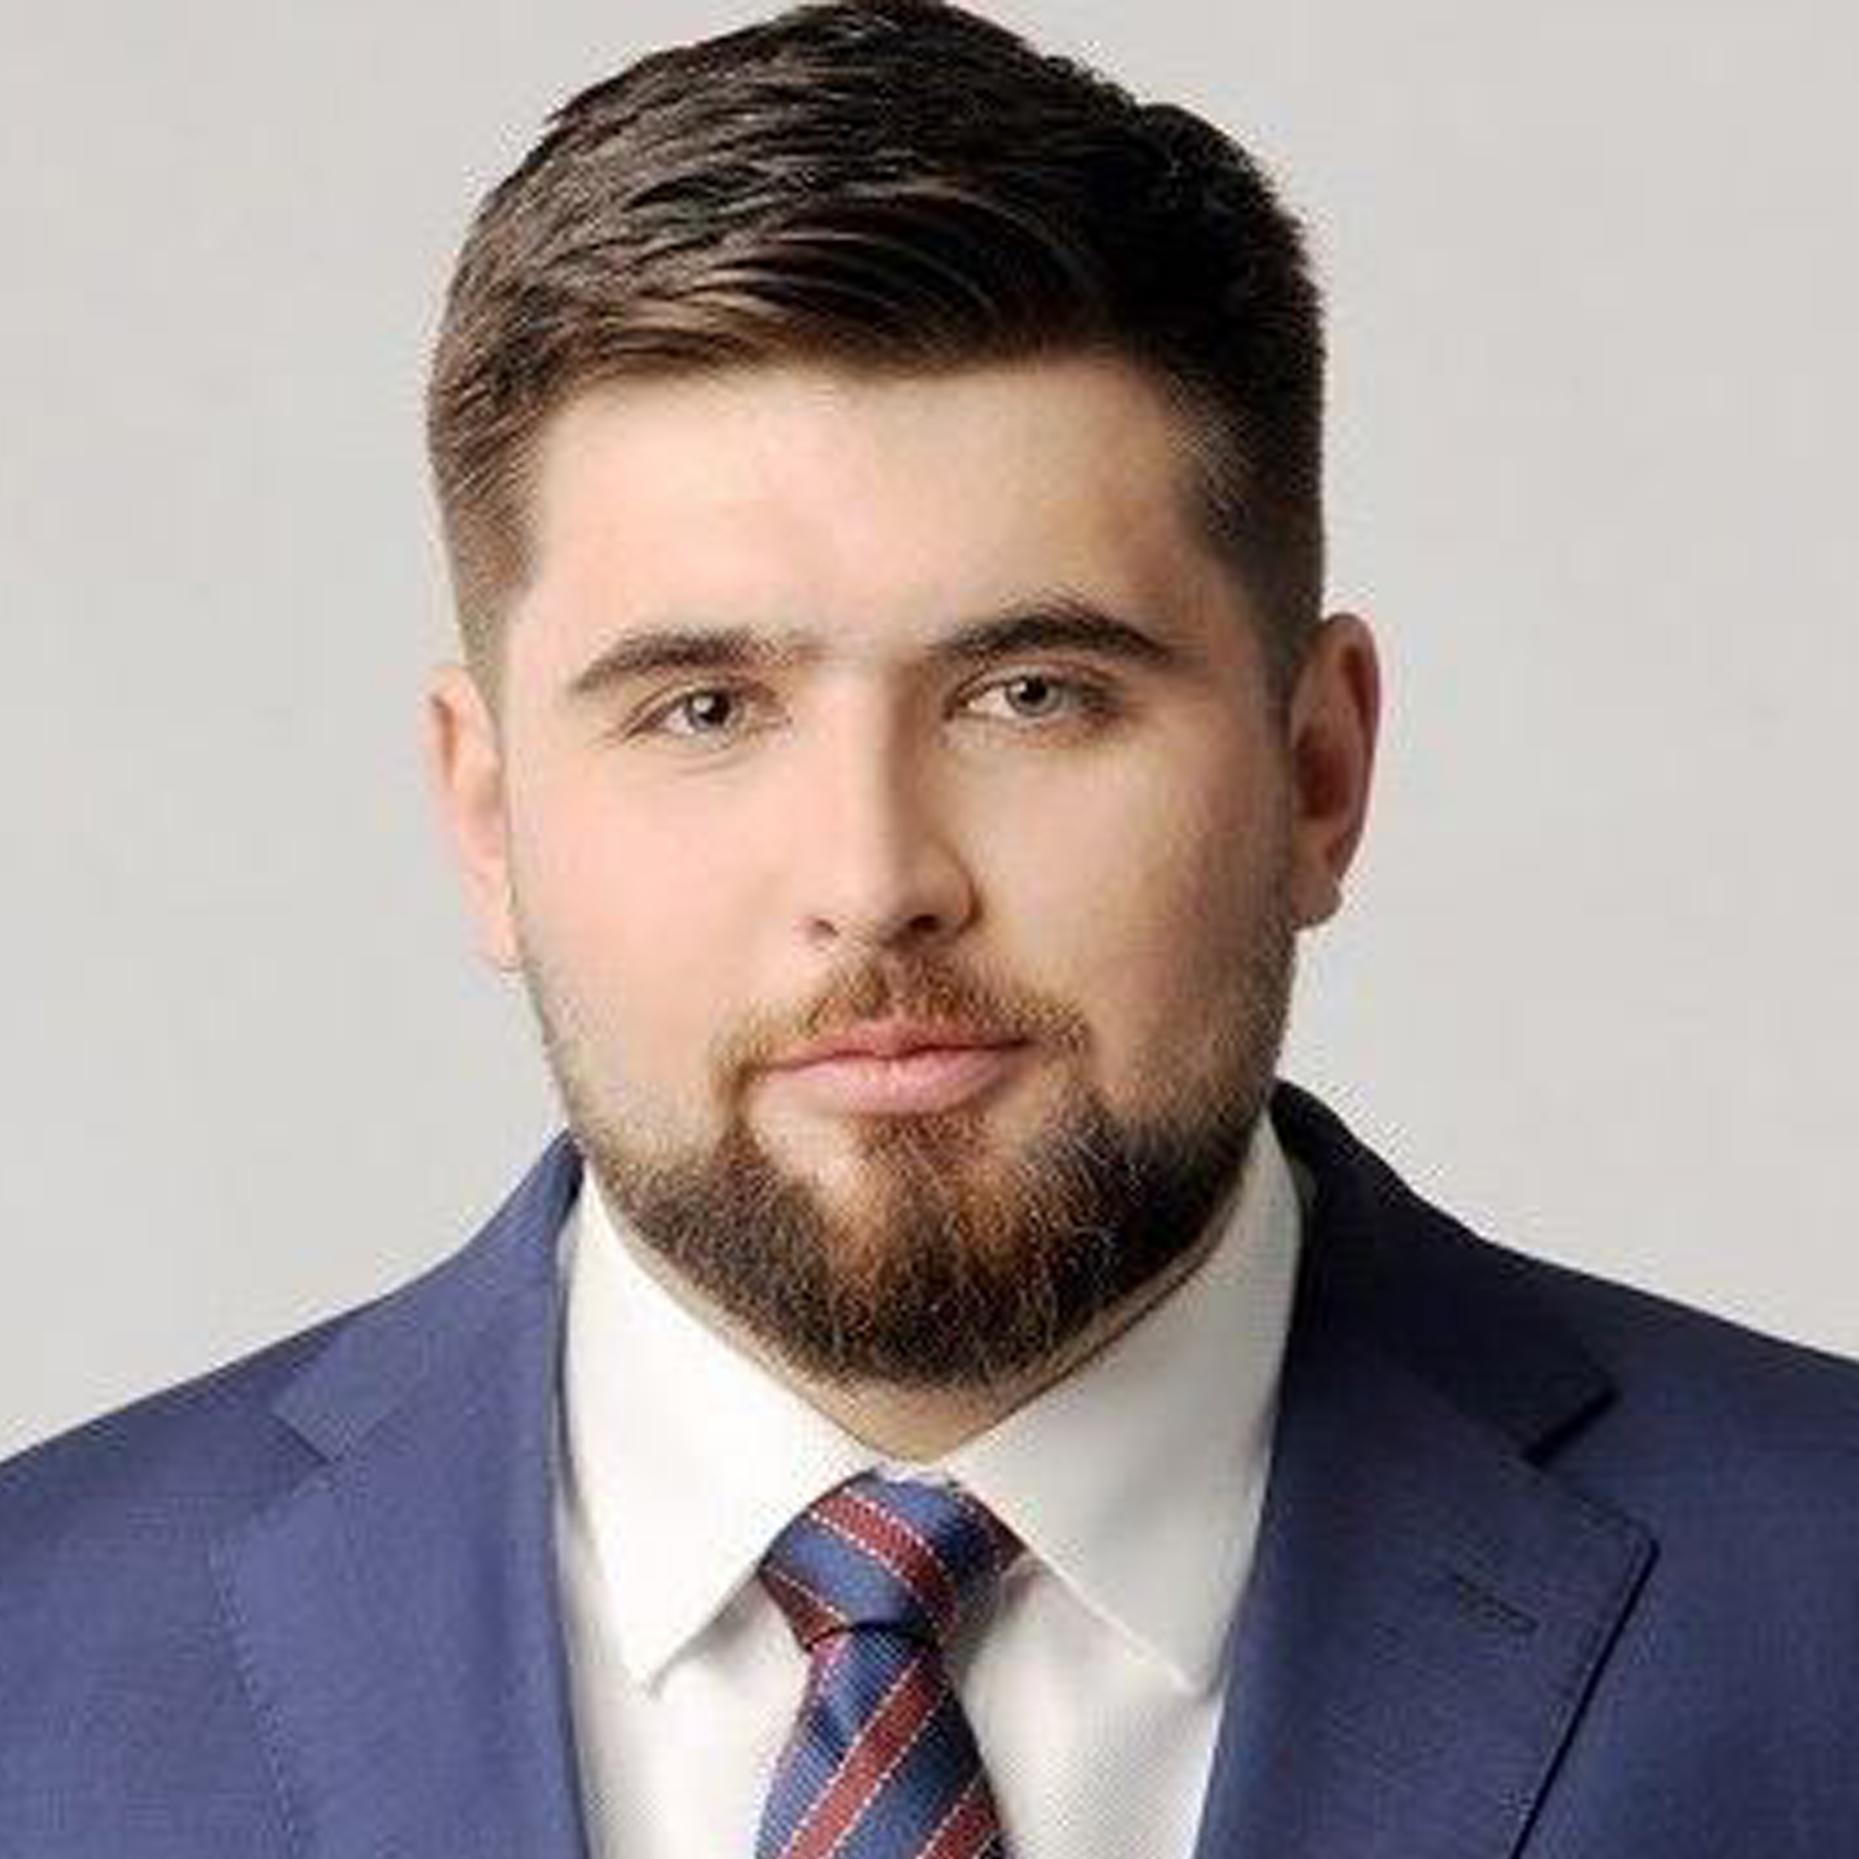 Jakub Banaszek